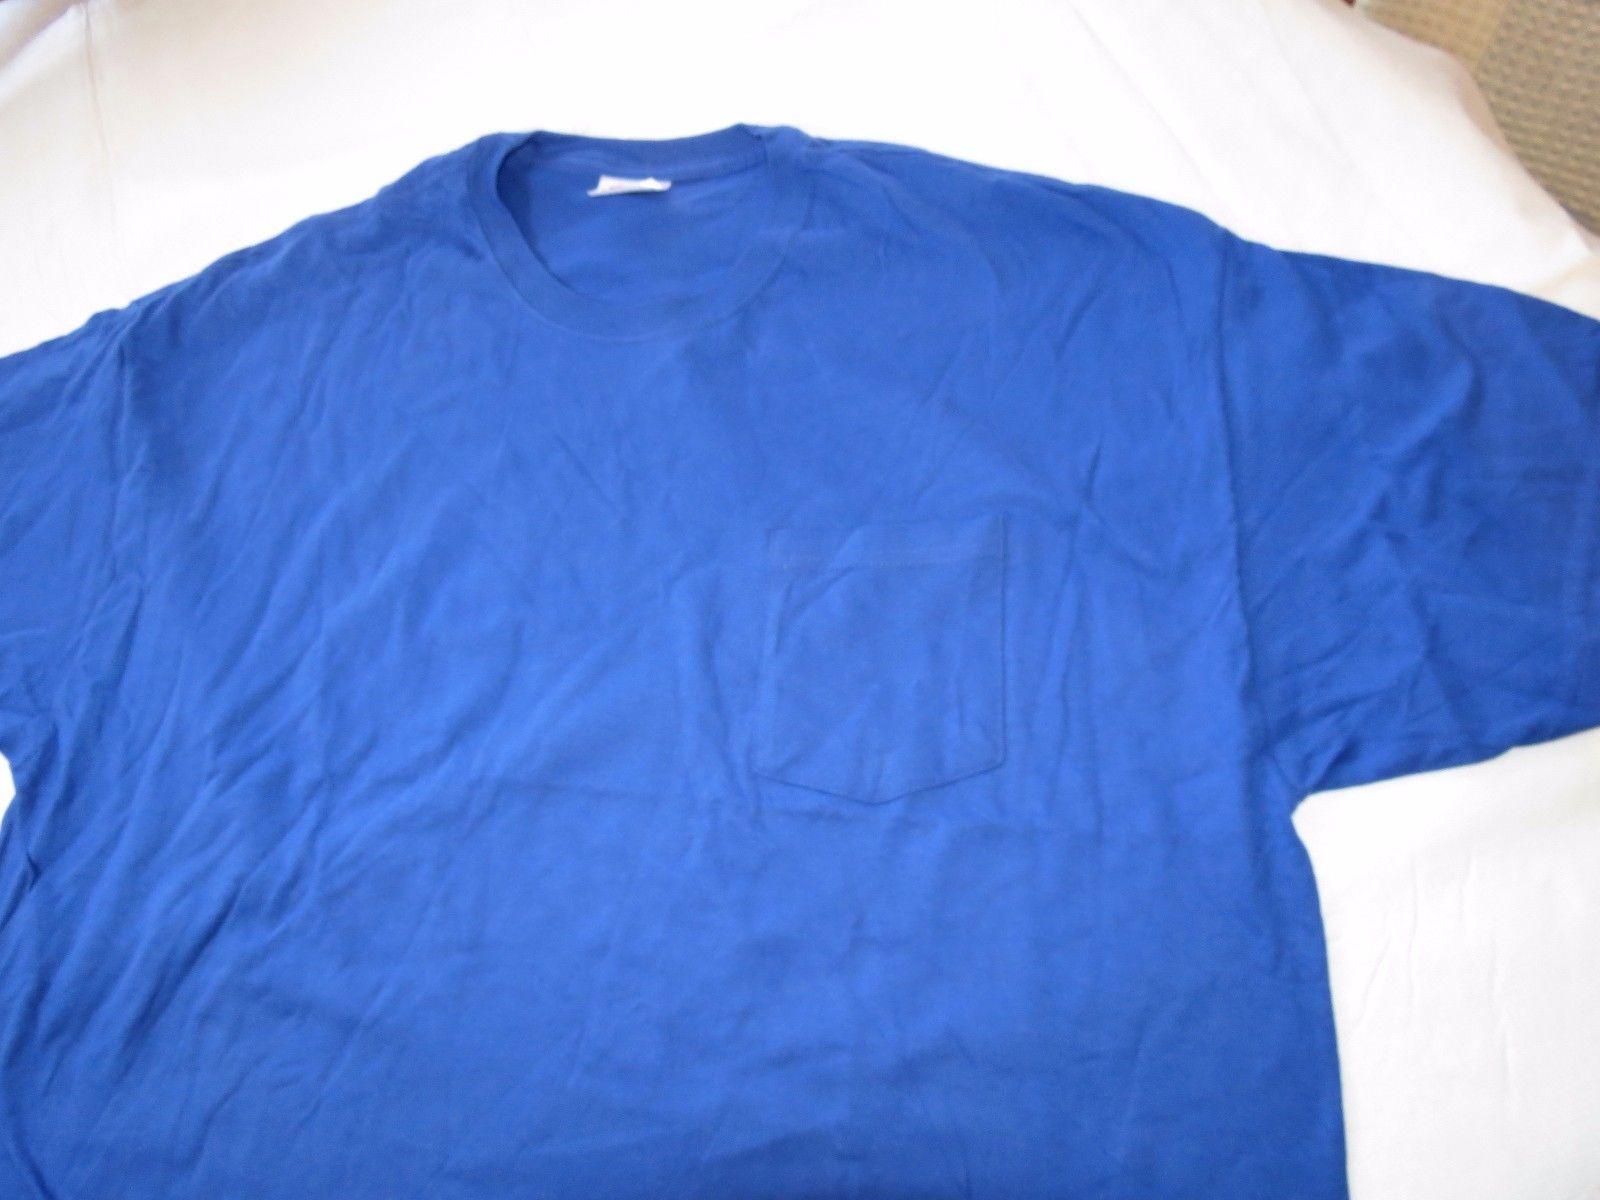 Hanes Heavyweight adult XXL 2XL 50-52 mens short sleeve shirt royal blue NOS